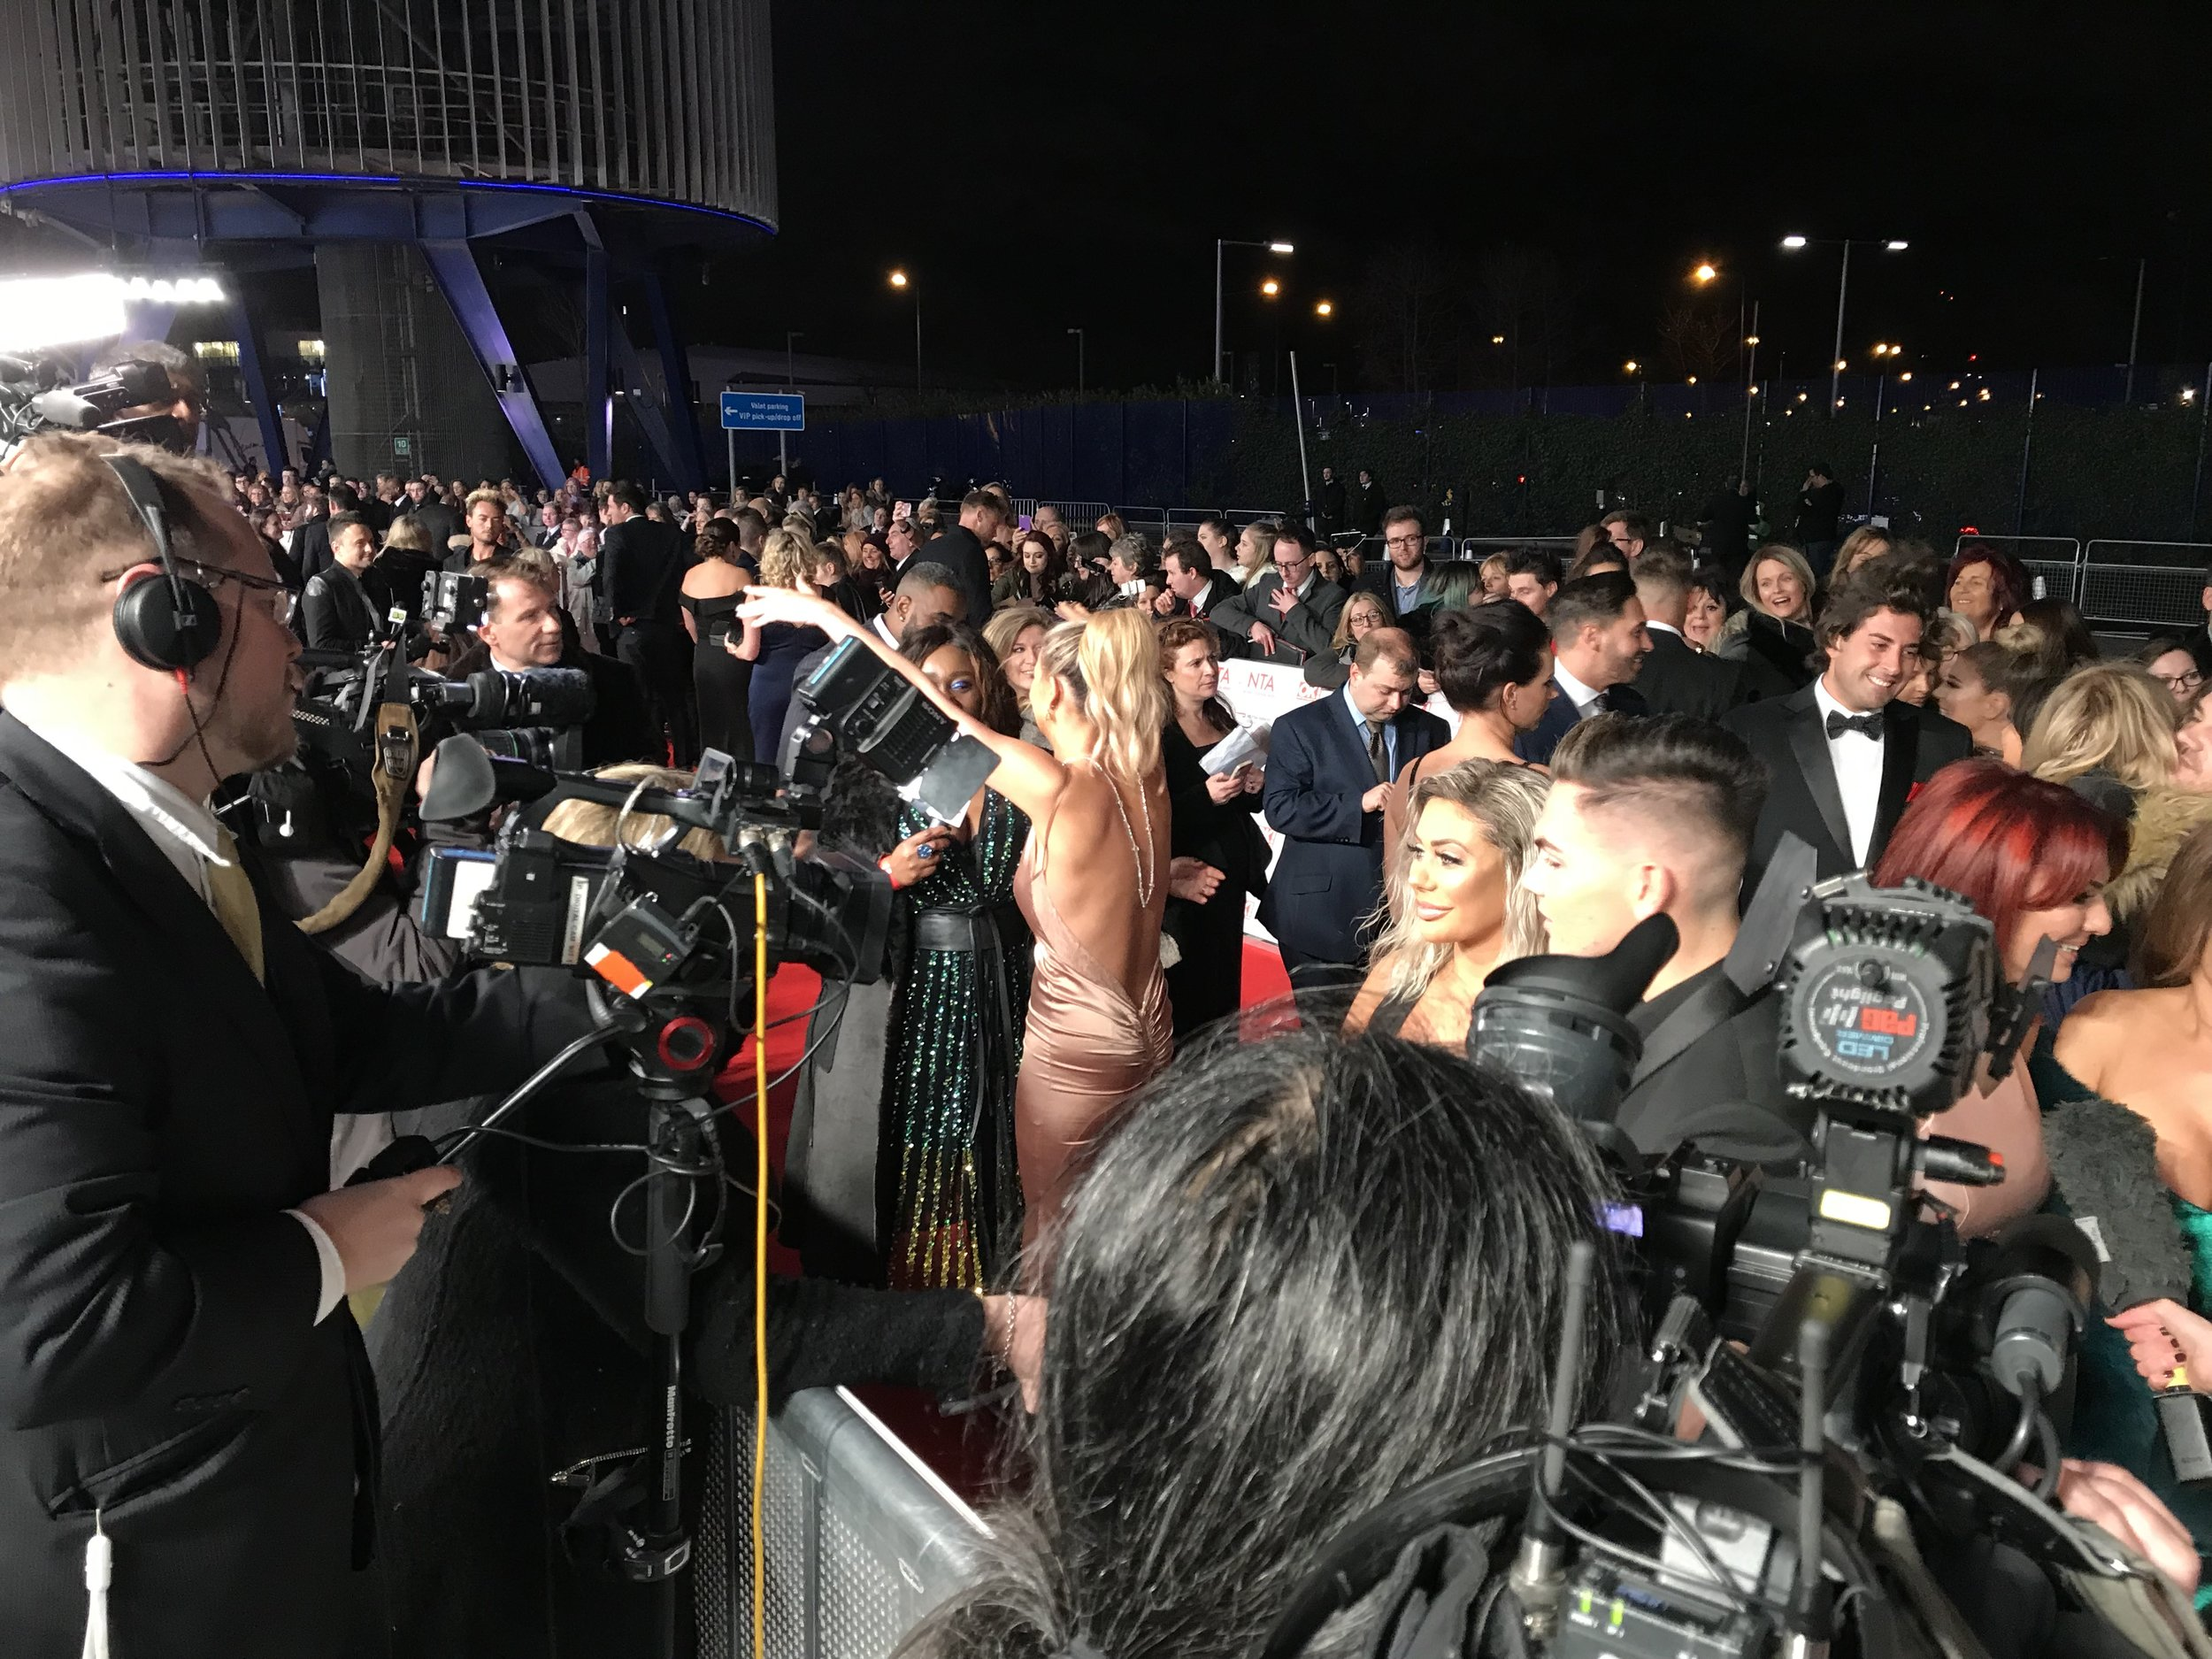 A Media scrum in full flow